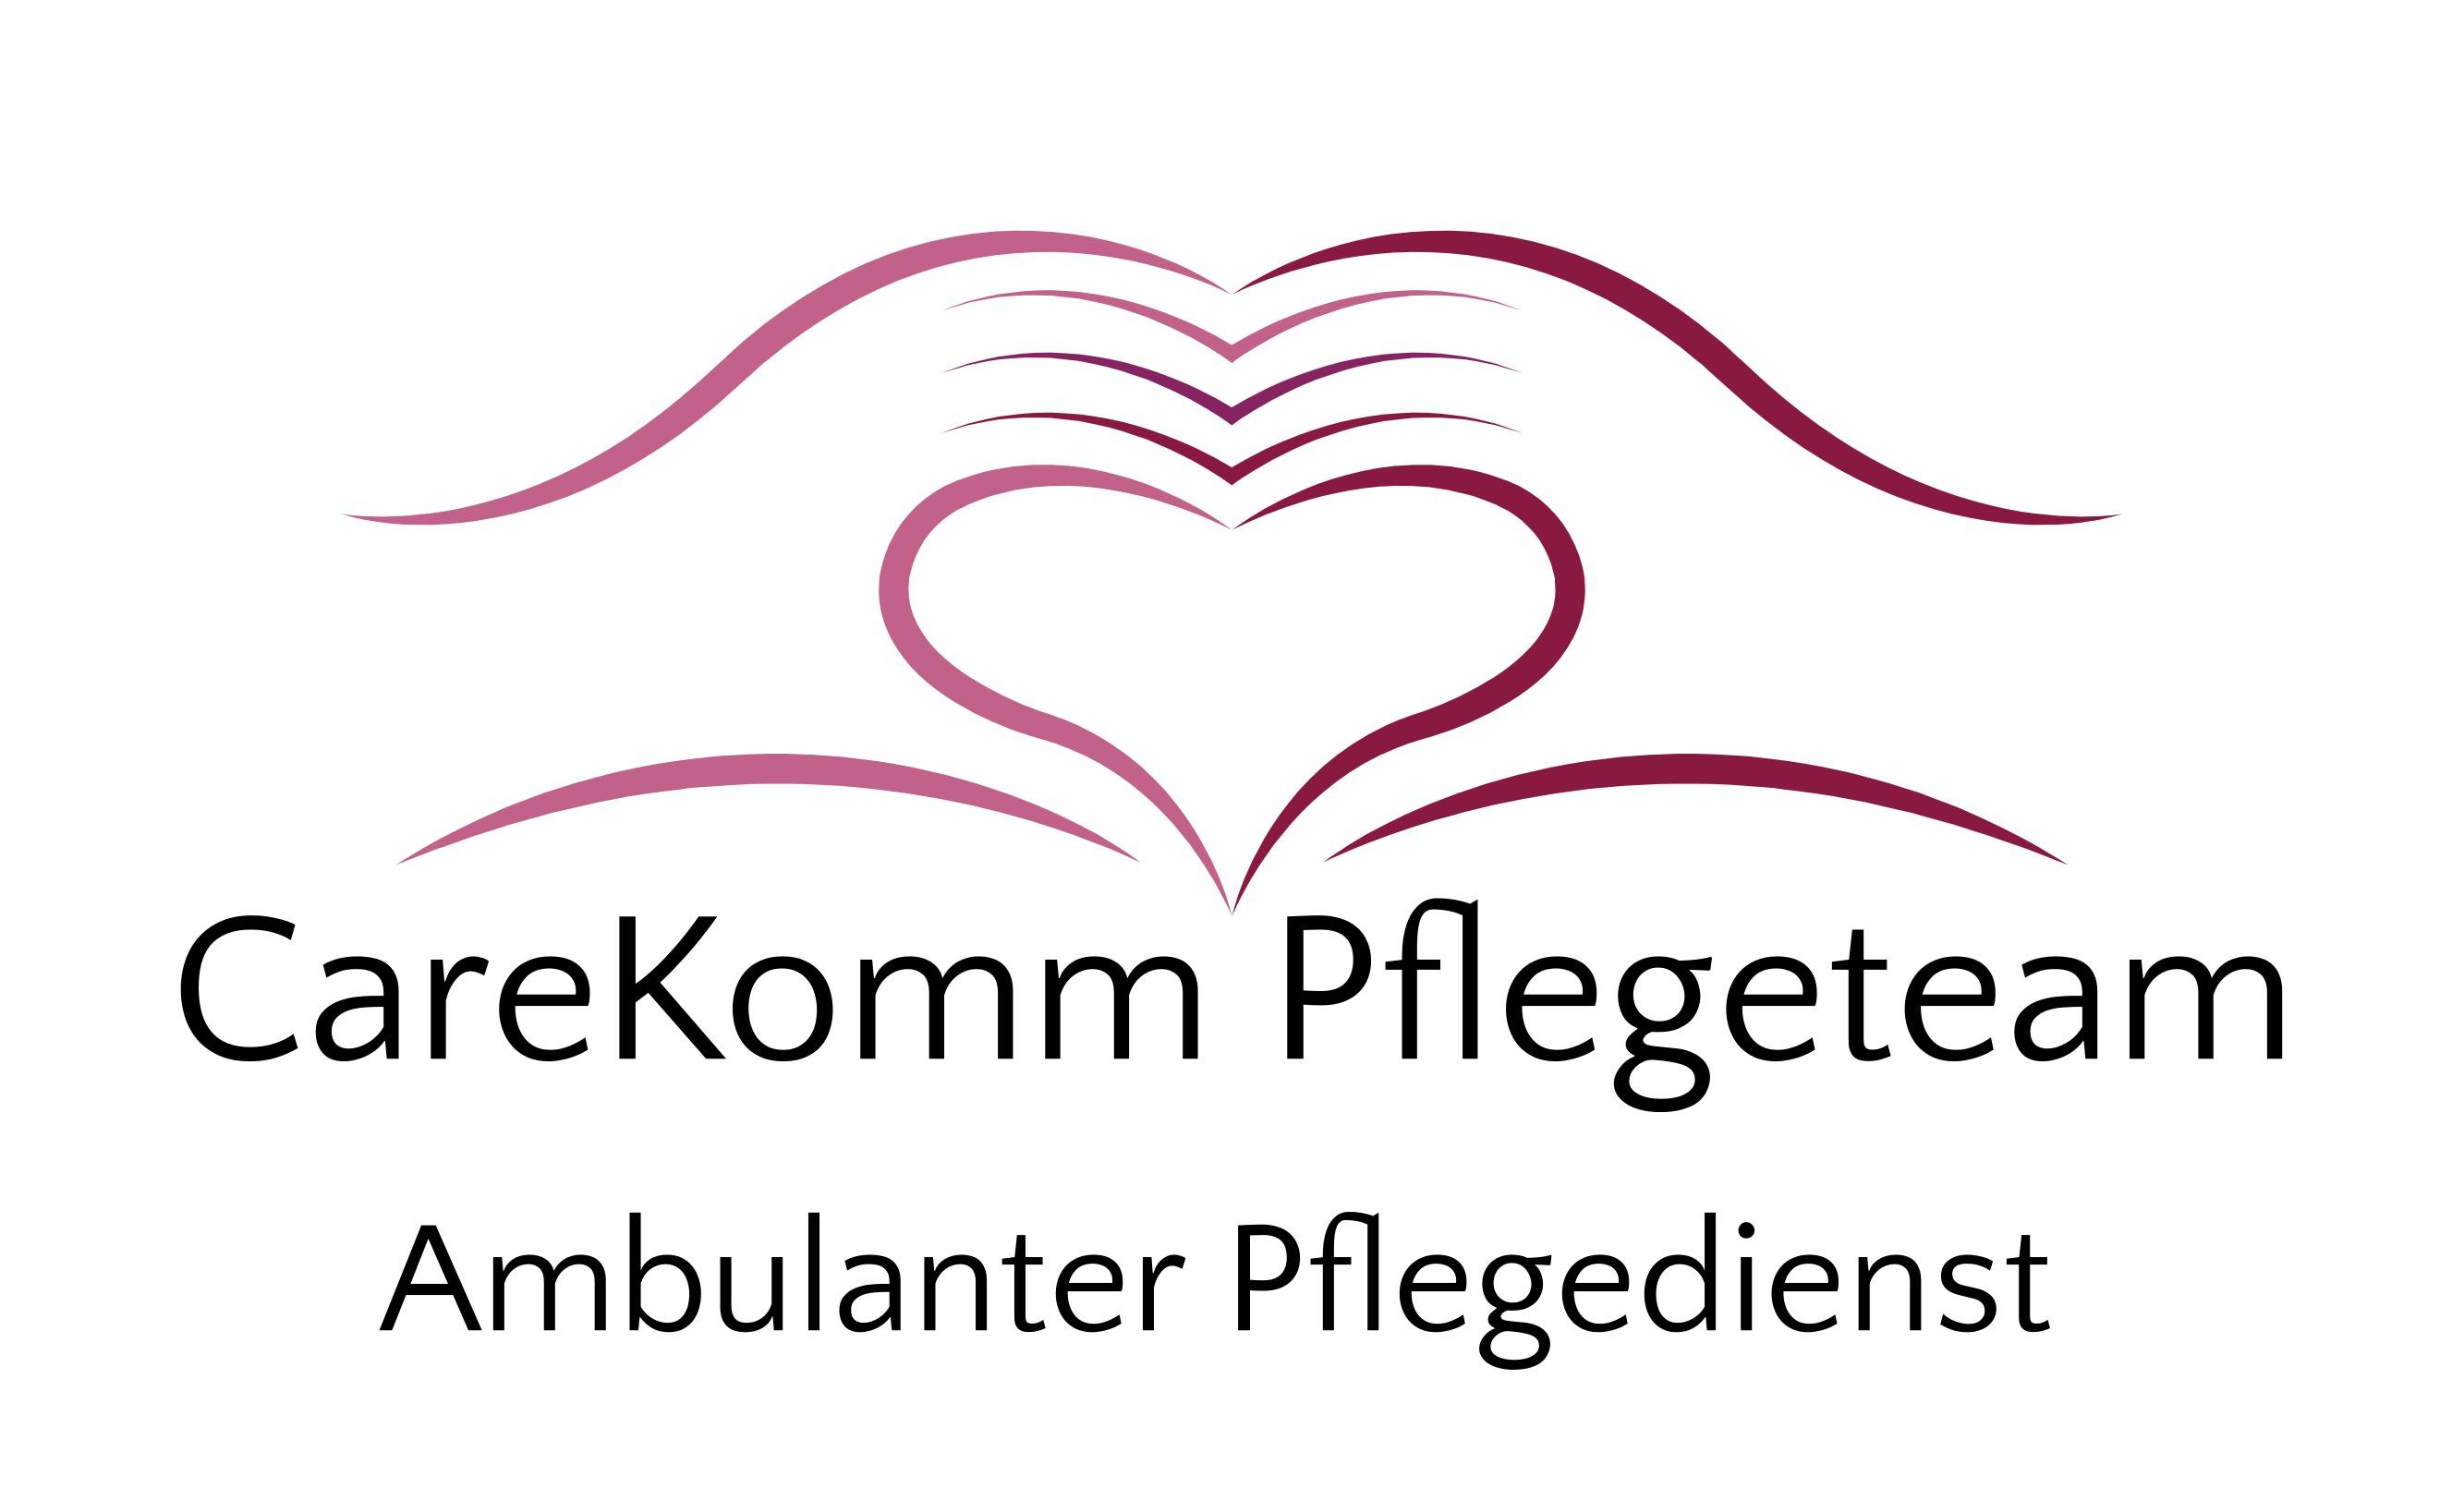 CareKomm Pflegeteam GmbH